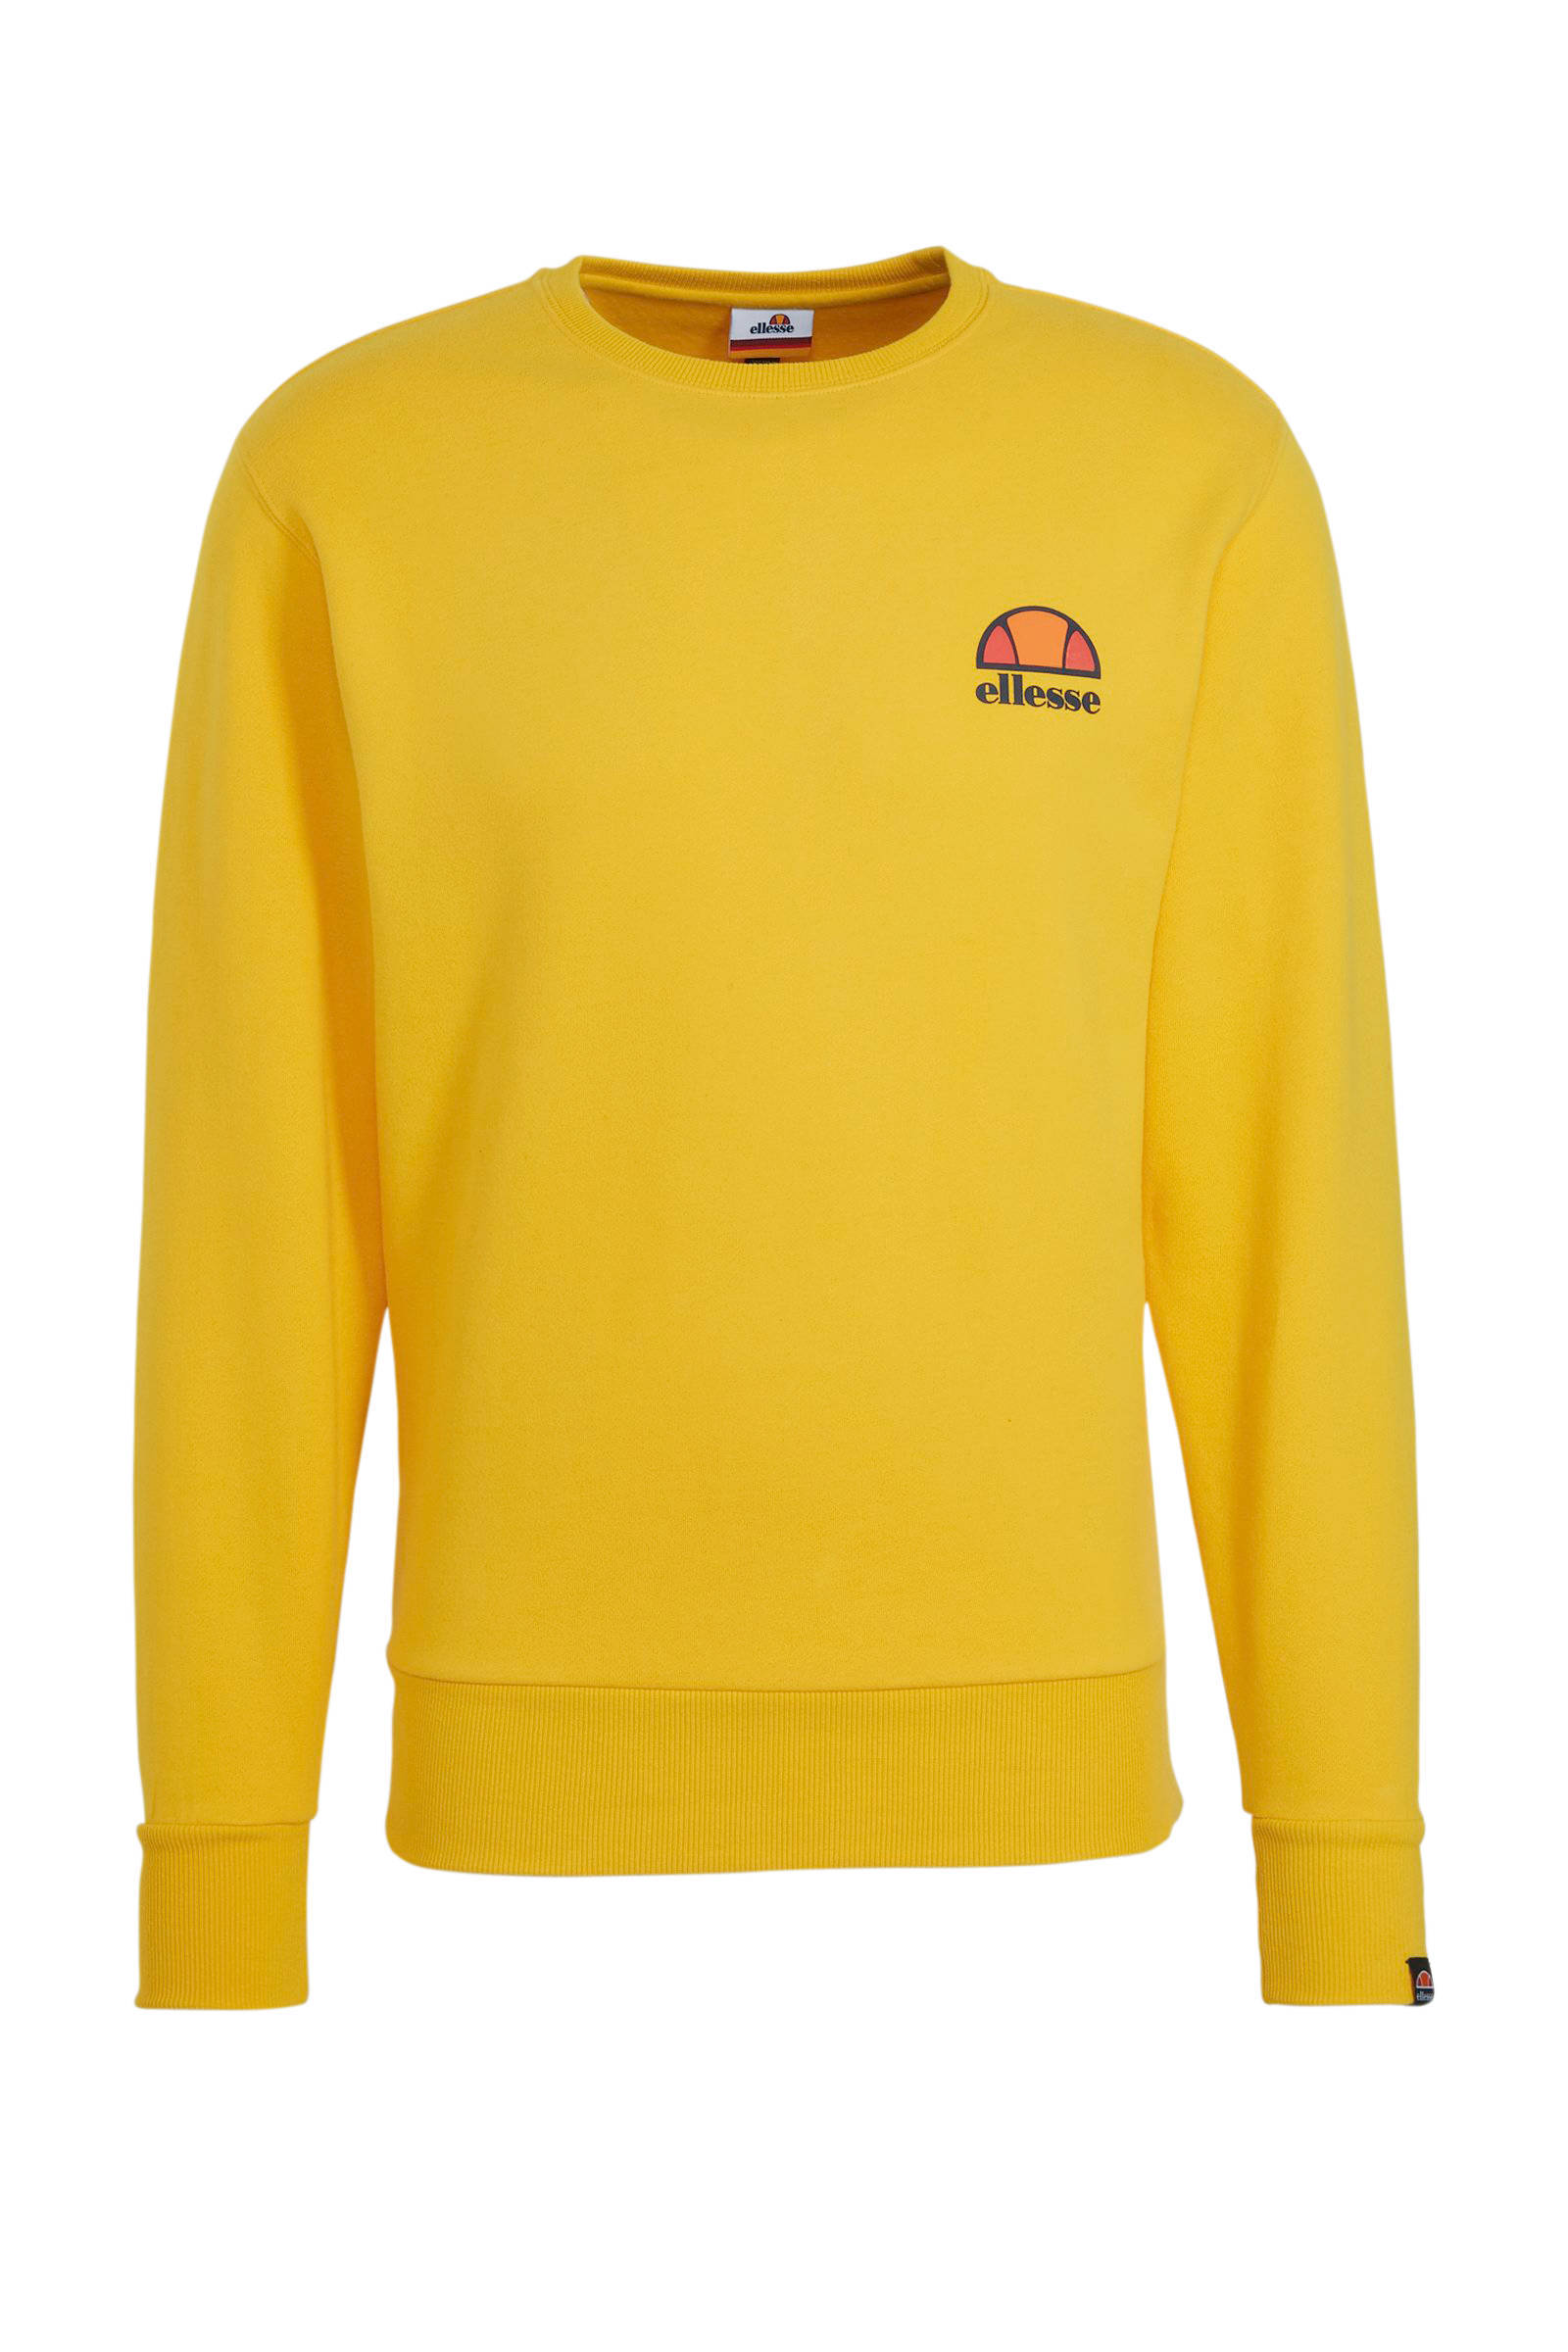 ellesse sweater dames yellow